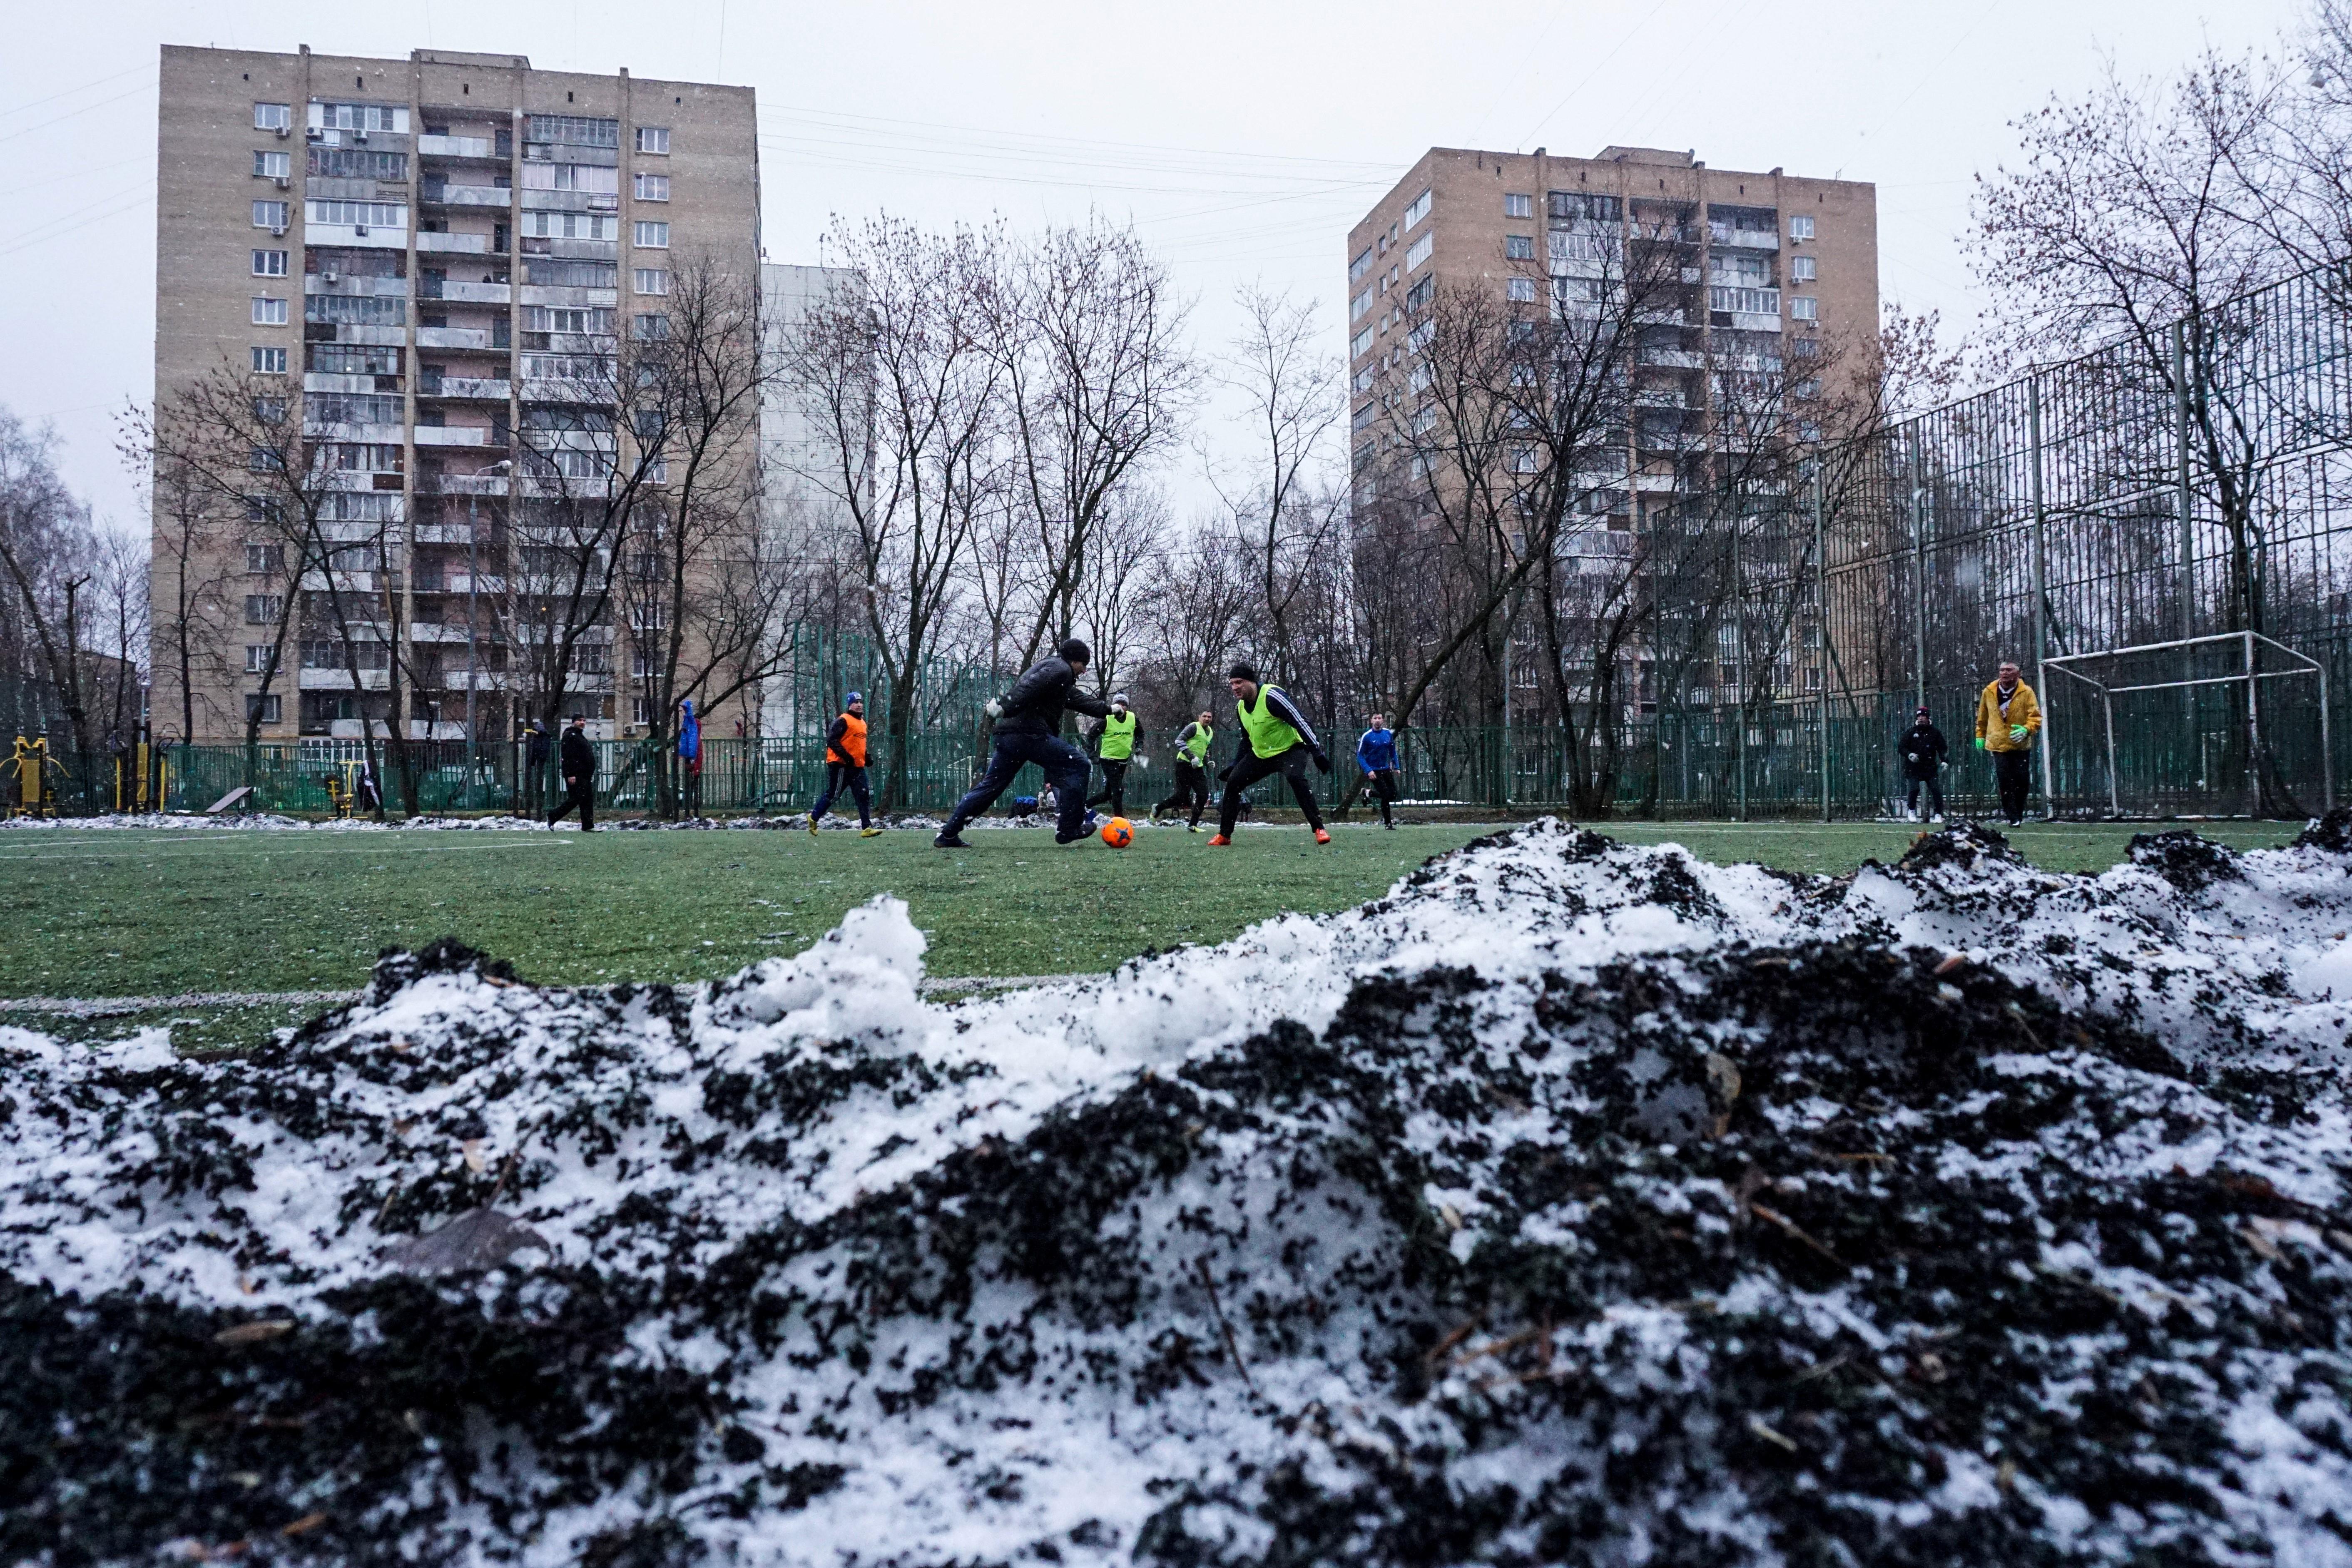 Un adolescent attaque ses camarades à la hache, sept blessés — Russie